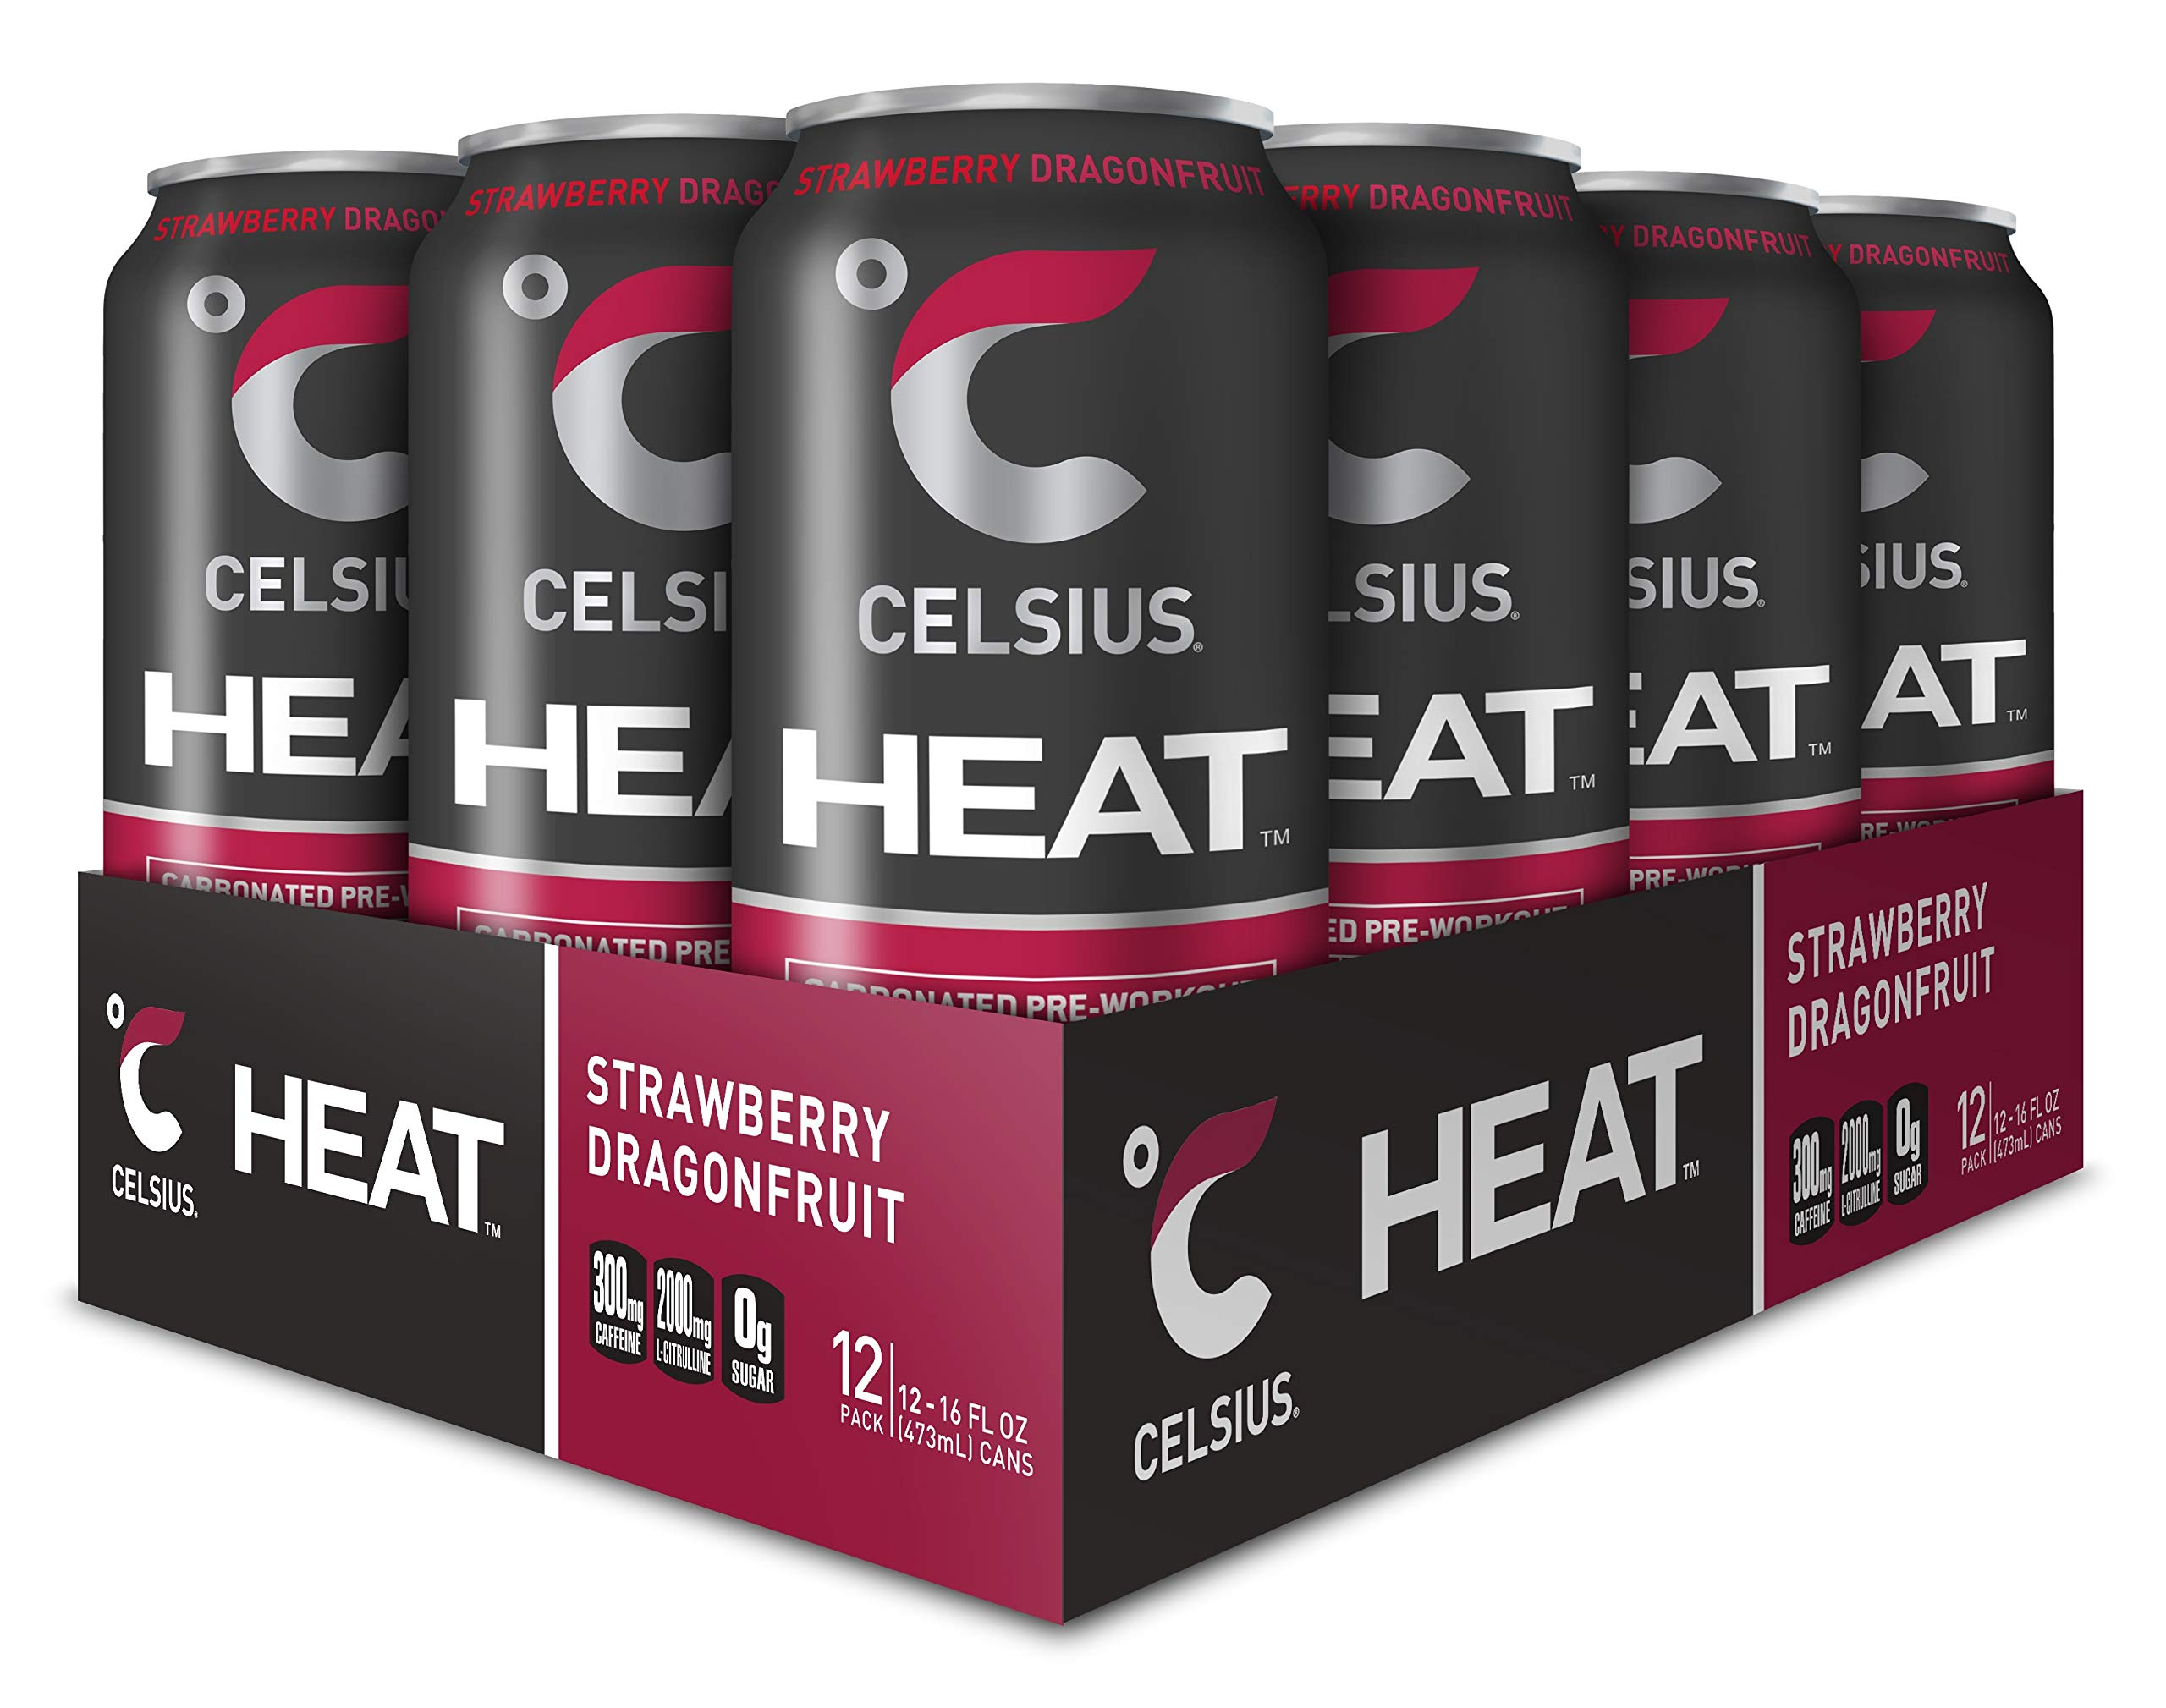 CELSIUS HEAT Strawberry Dragonfruit Performance Energy Drink, ZERO Sugar, 16oz. Can, 12 Pack